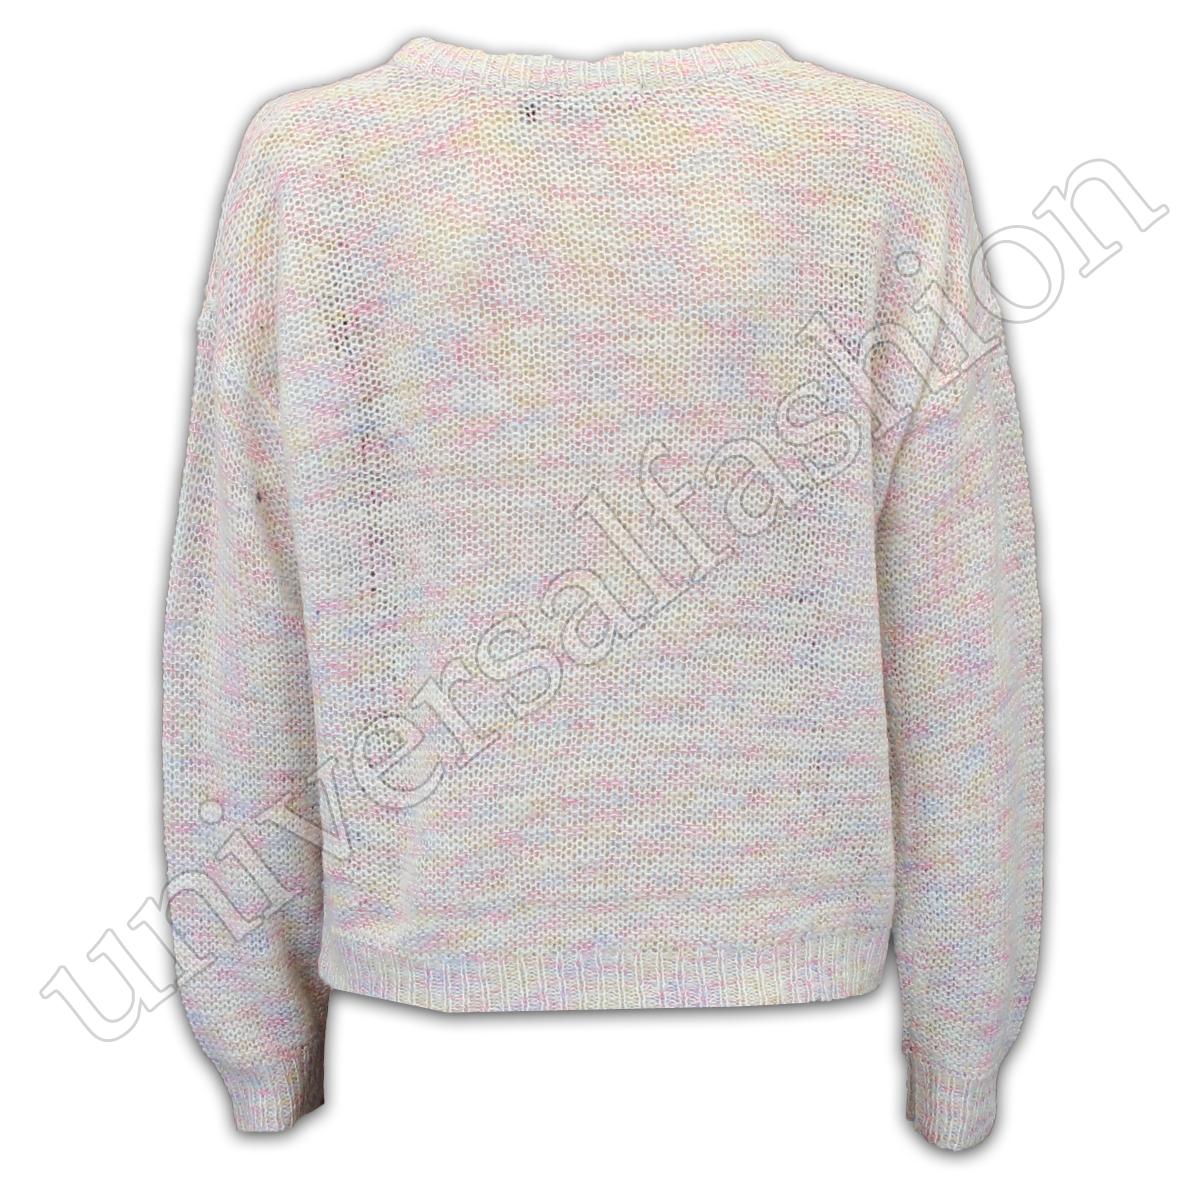 Jumper-Ladies-Alma-valiente-para-mujer-Knitted-holgados-Top-Sweater-Pullover-de-punto-Partido miniatura 3